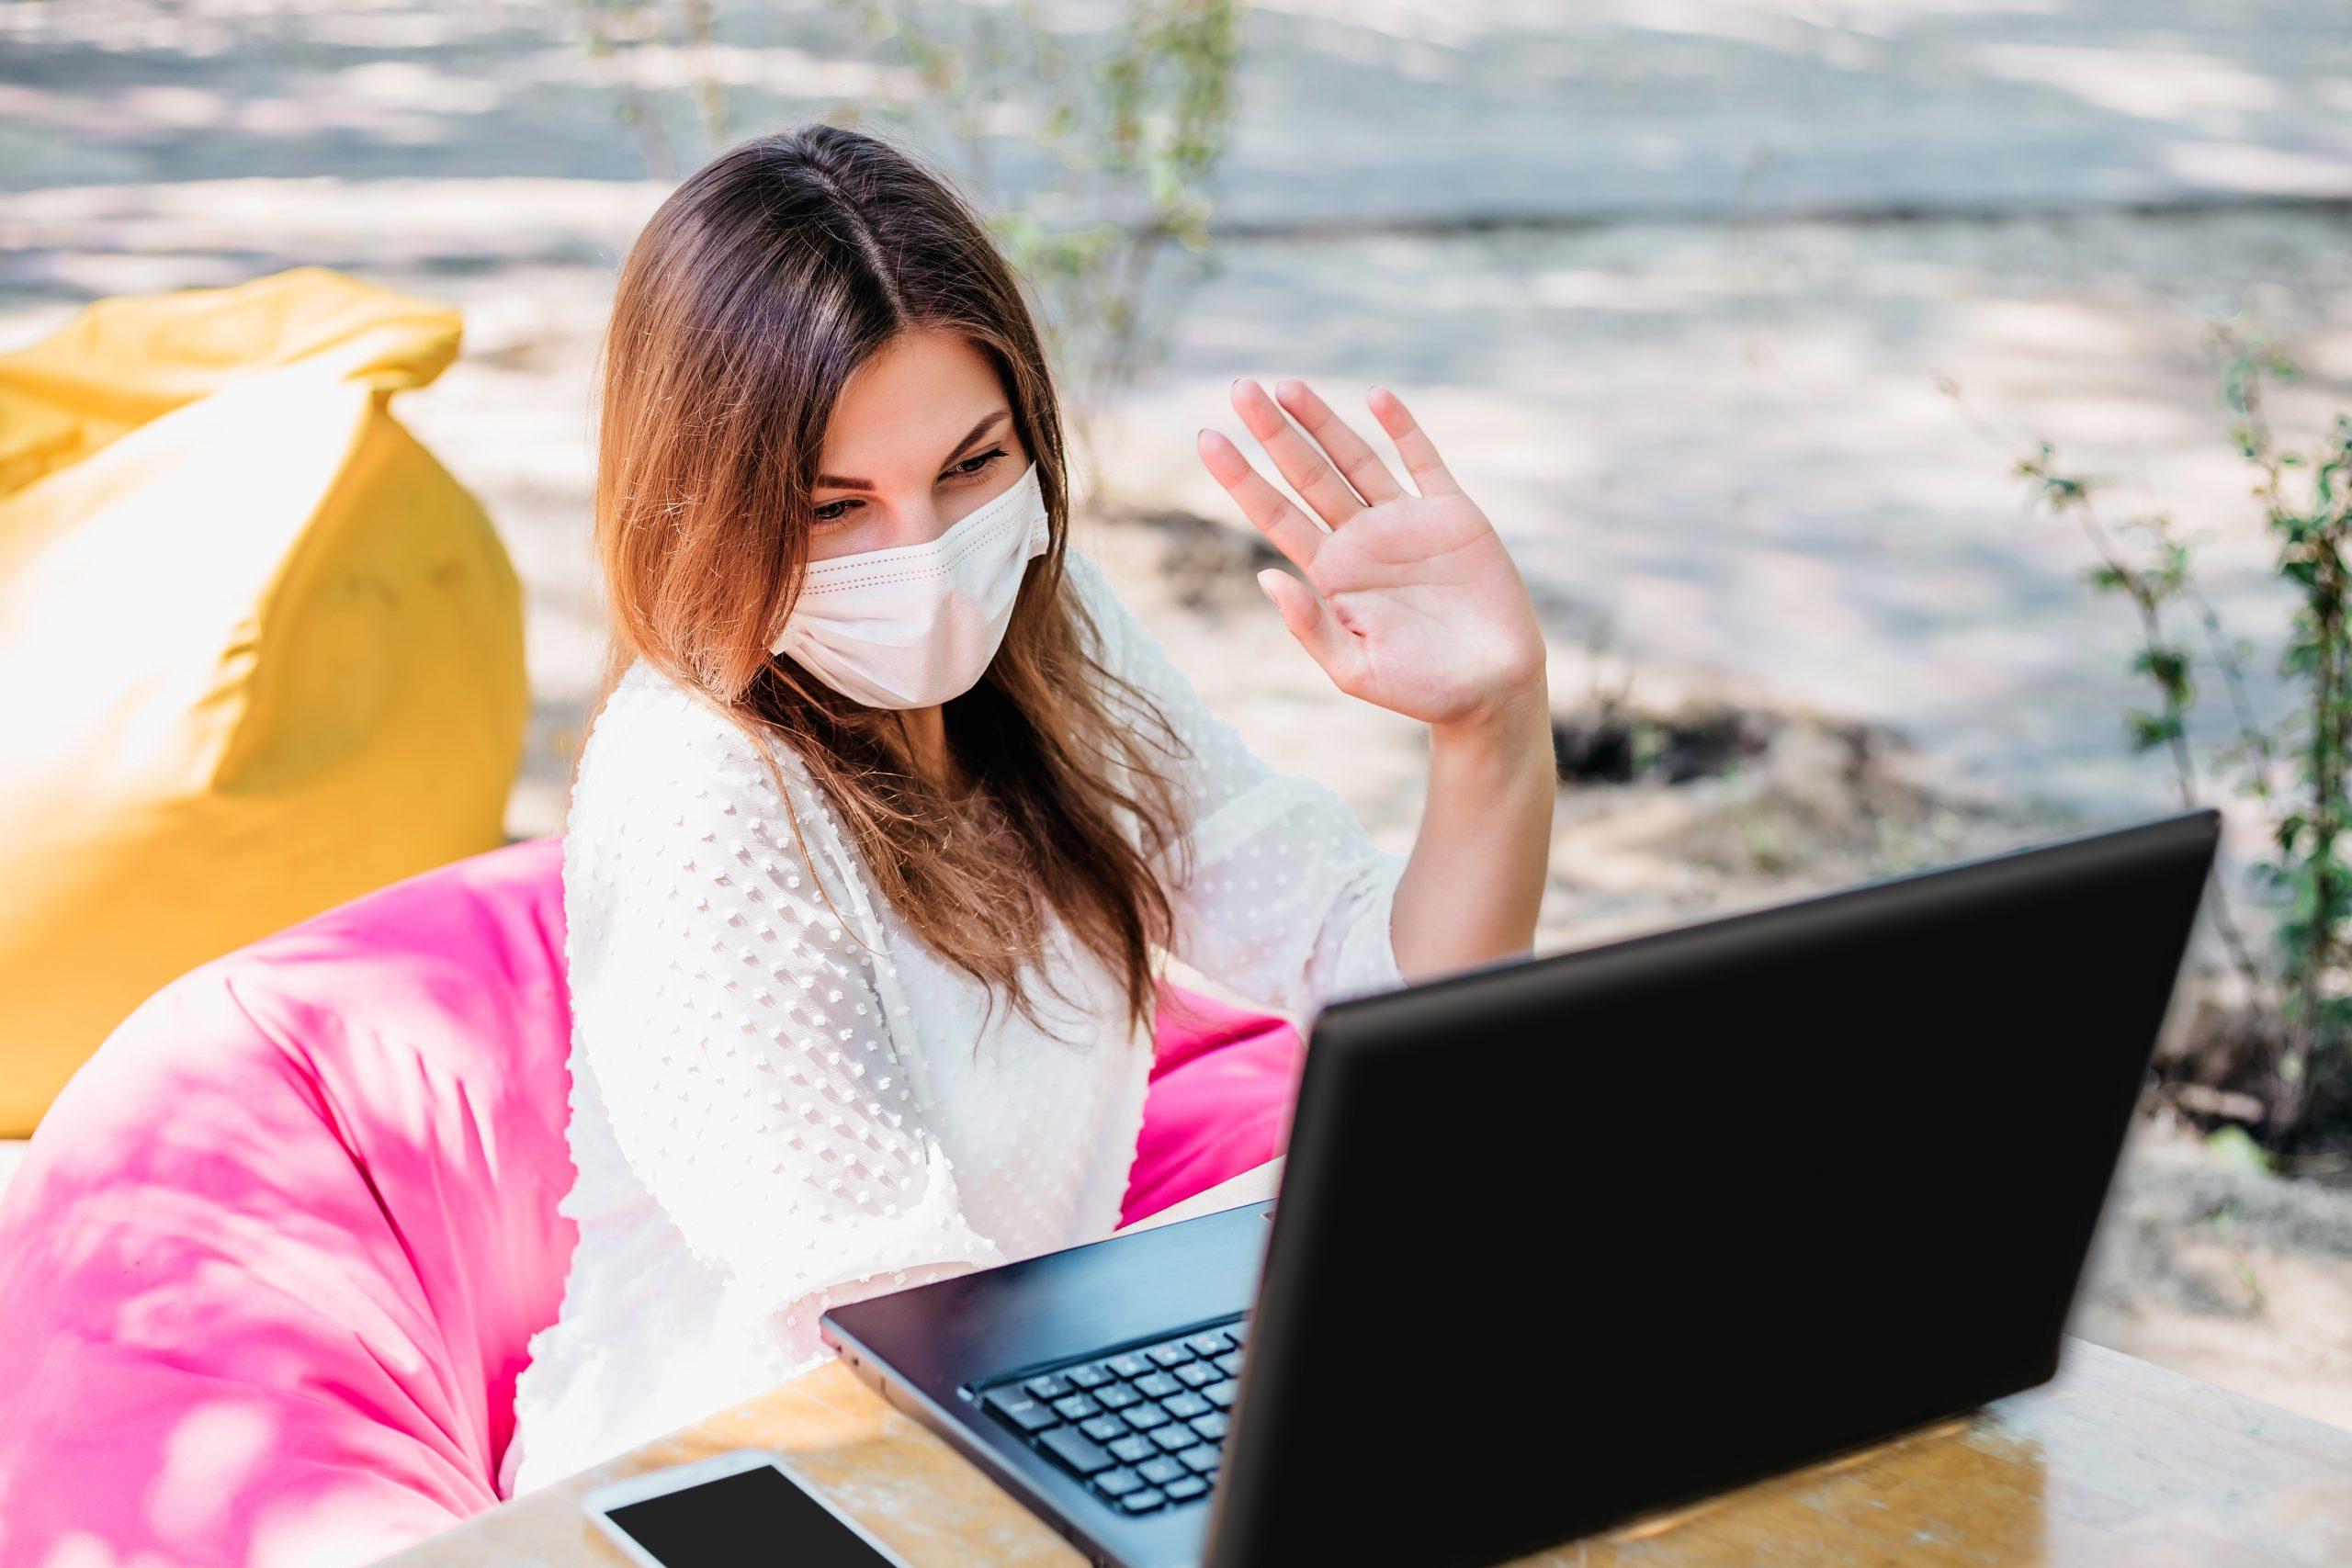 Lady Using Laptop | Axiom Communications